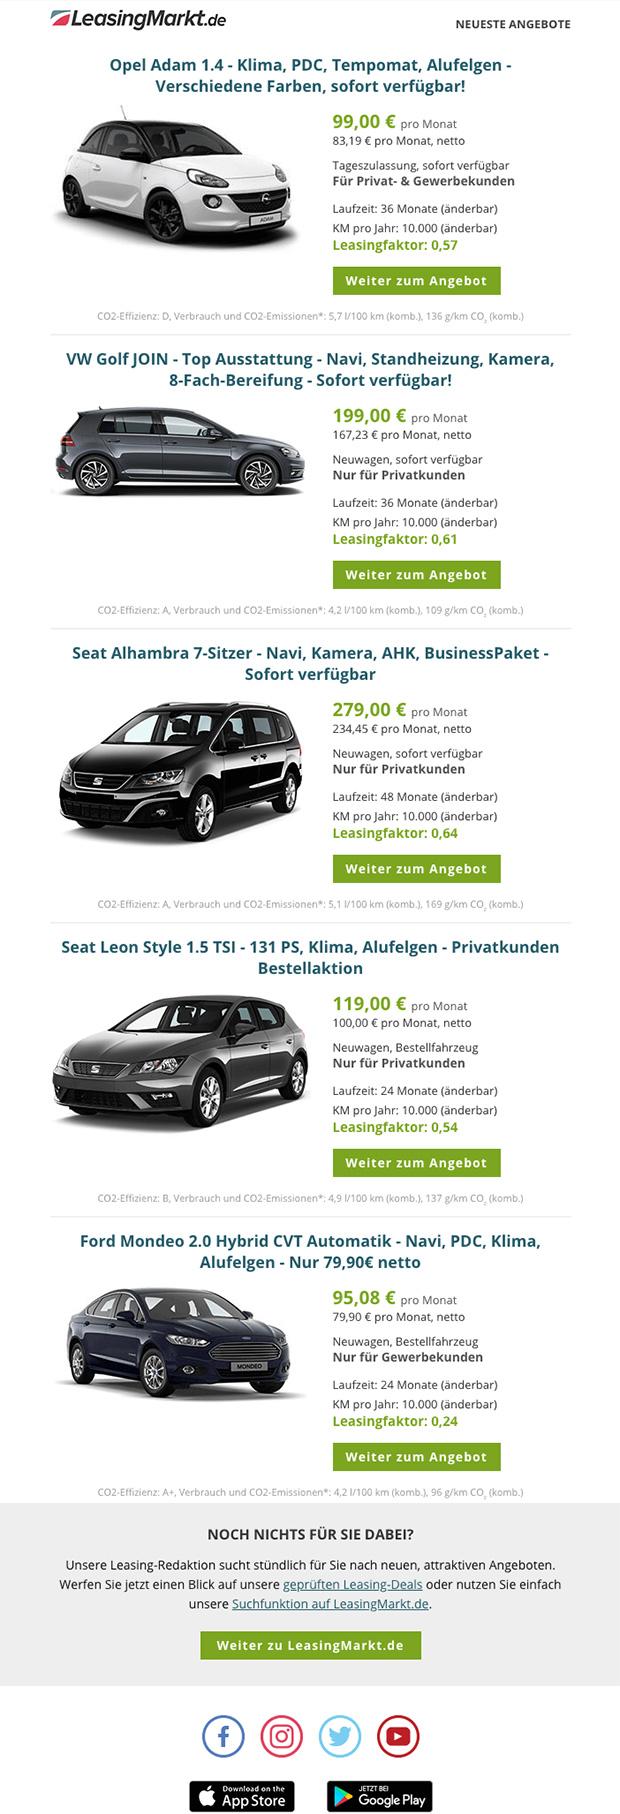 Vorschau LeasingMarkt.de Newsletter